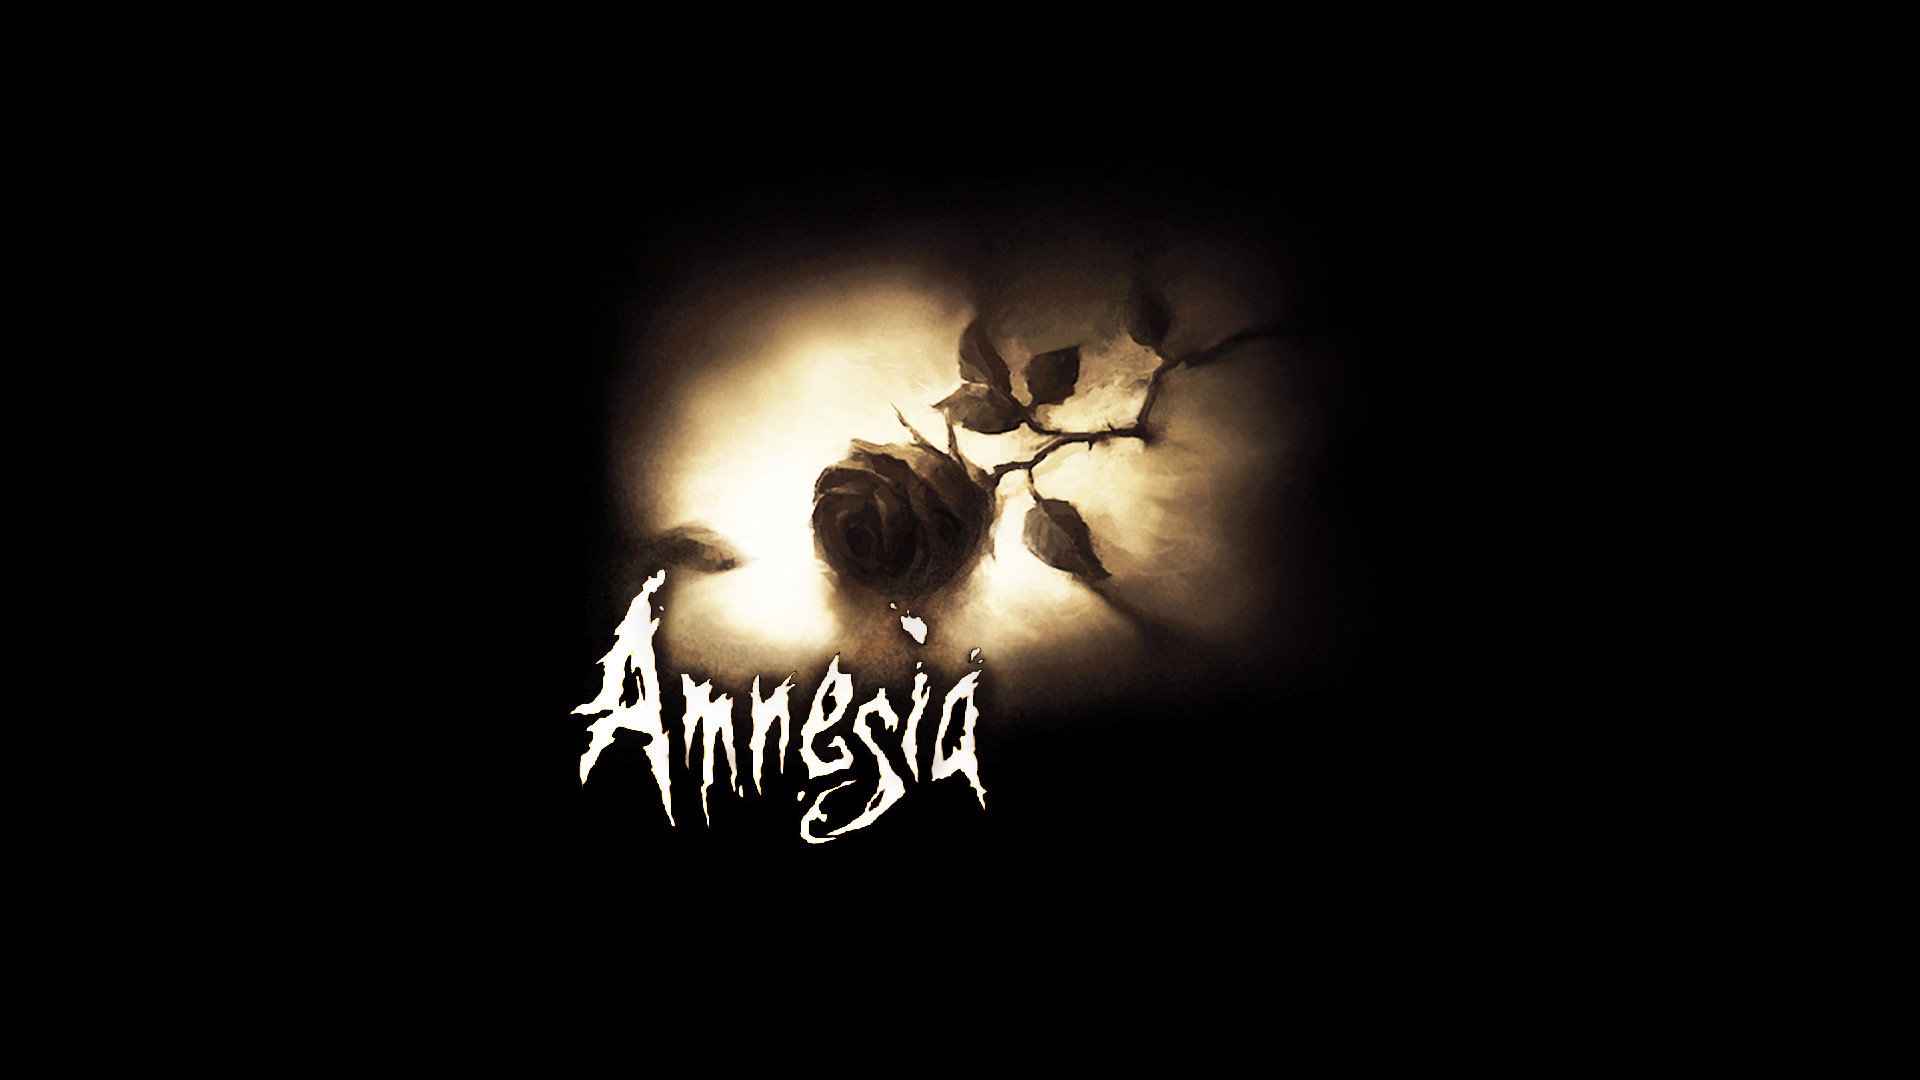 Amnesia The Dark Descent Wallpapers Hd For Desktop Backgrounds